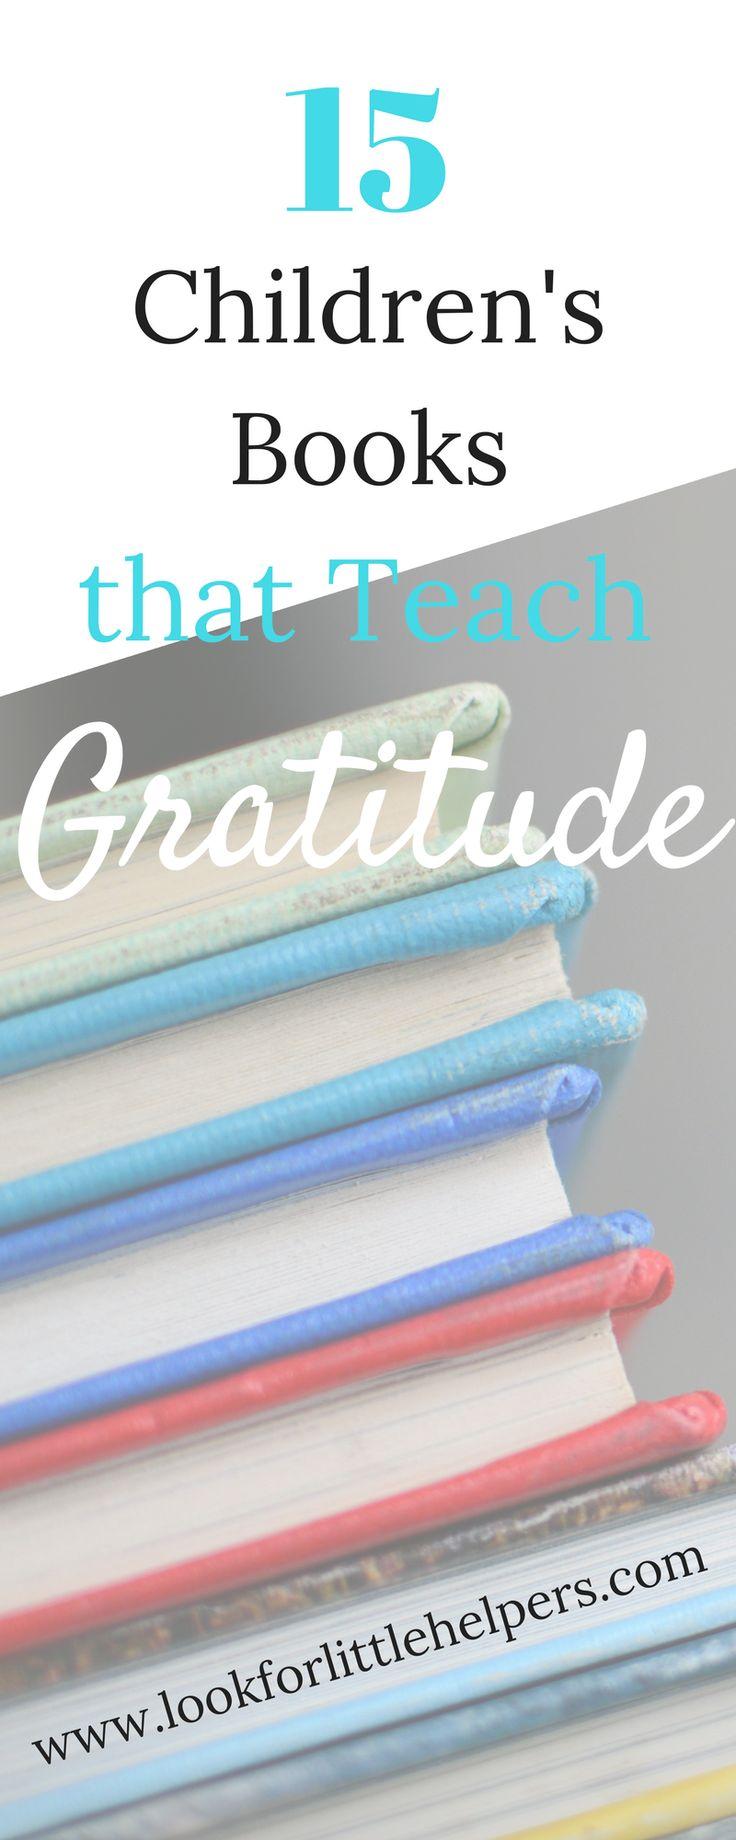 Teach kids to be grateful.  Books that teach gratitude. #gratitude